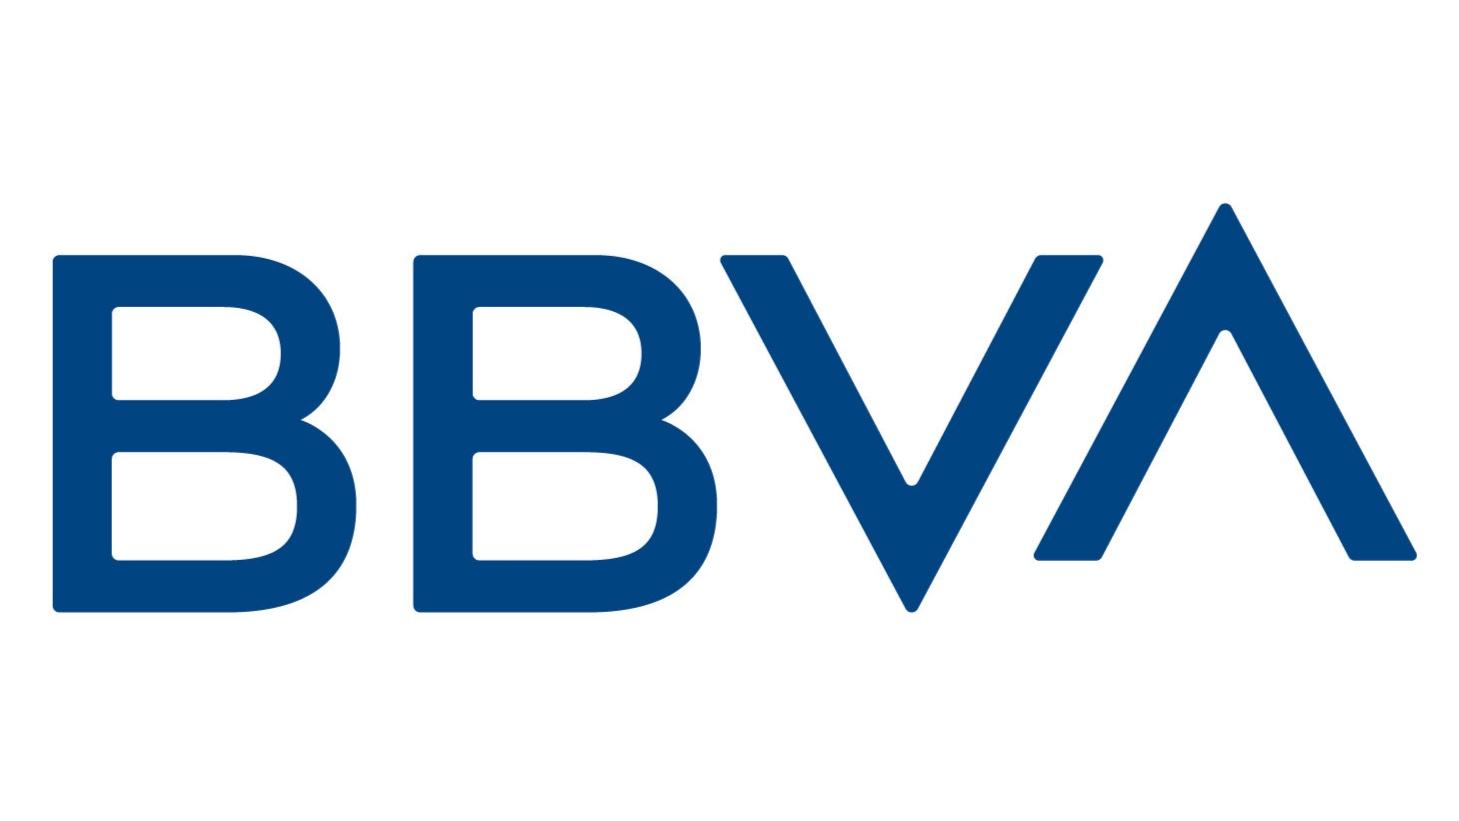 Logo-BBVA-1920x1080.jpg